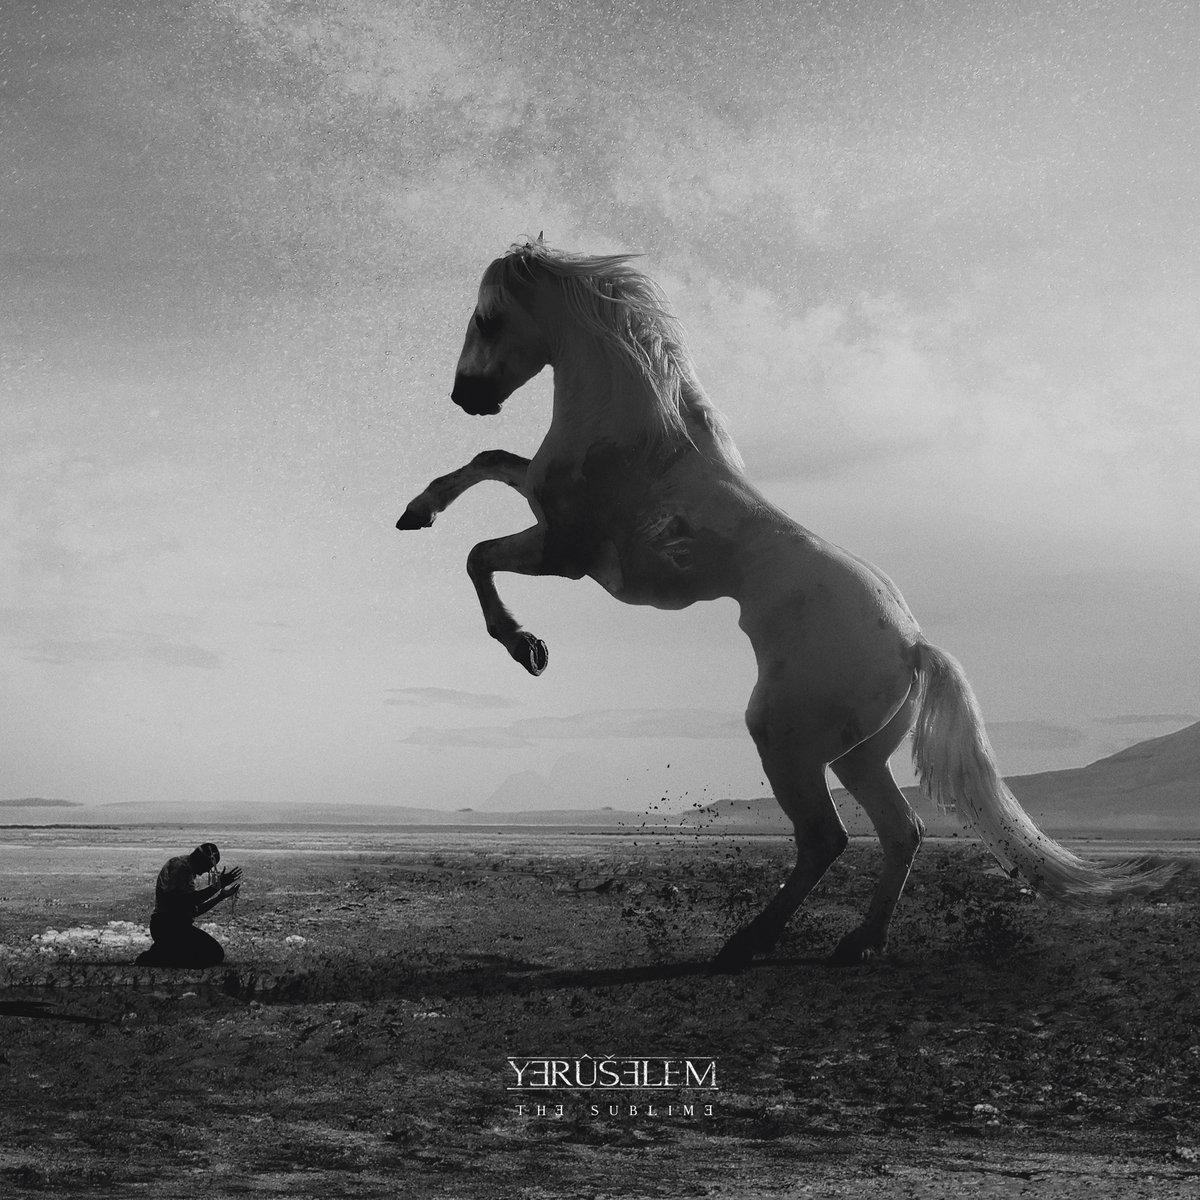 Yeruselem-The-Sublime